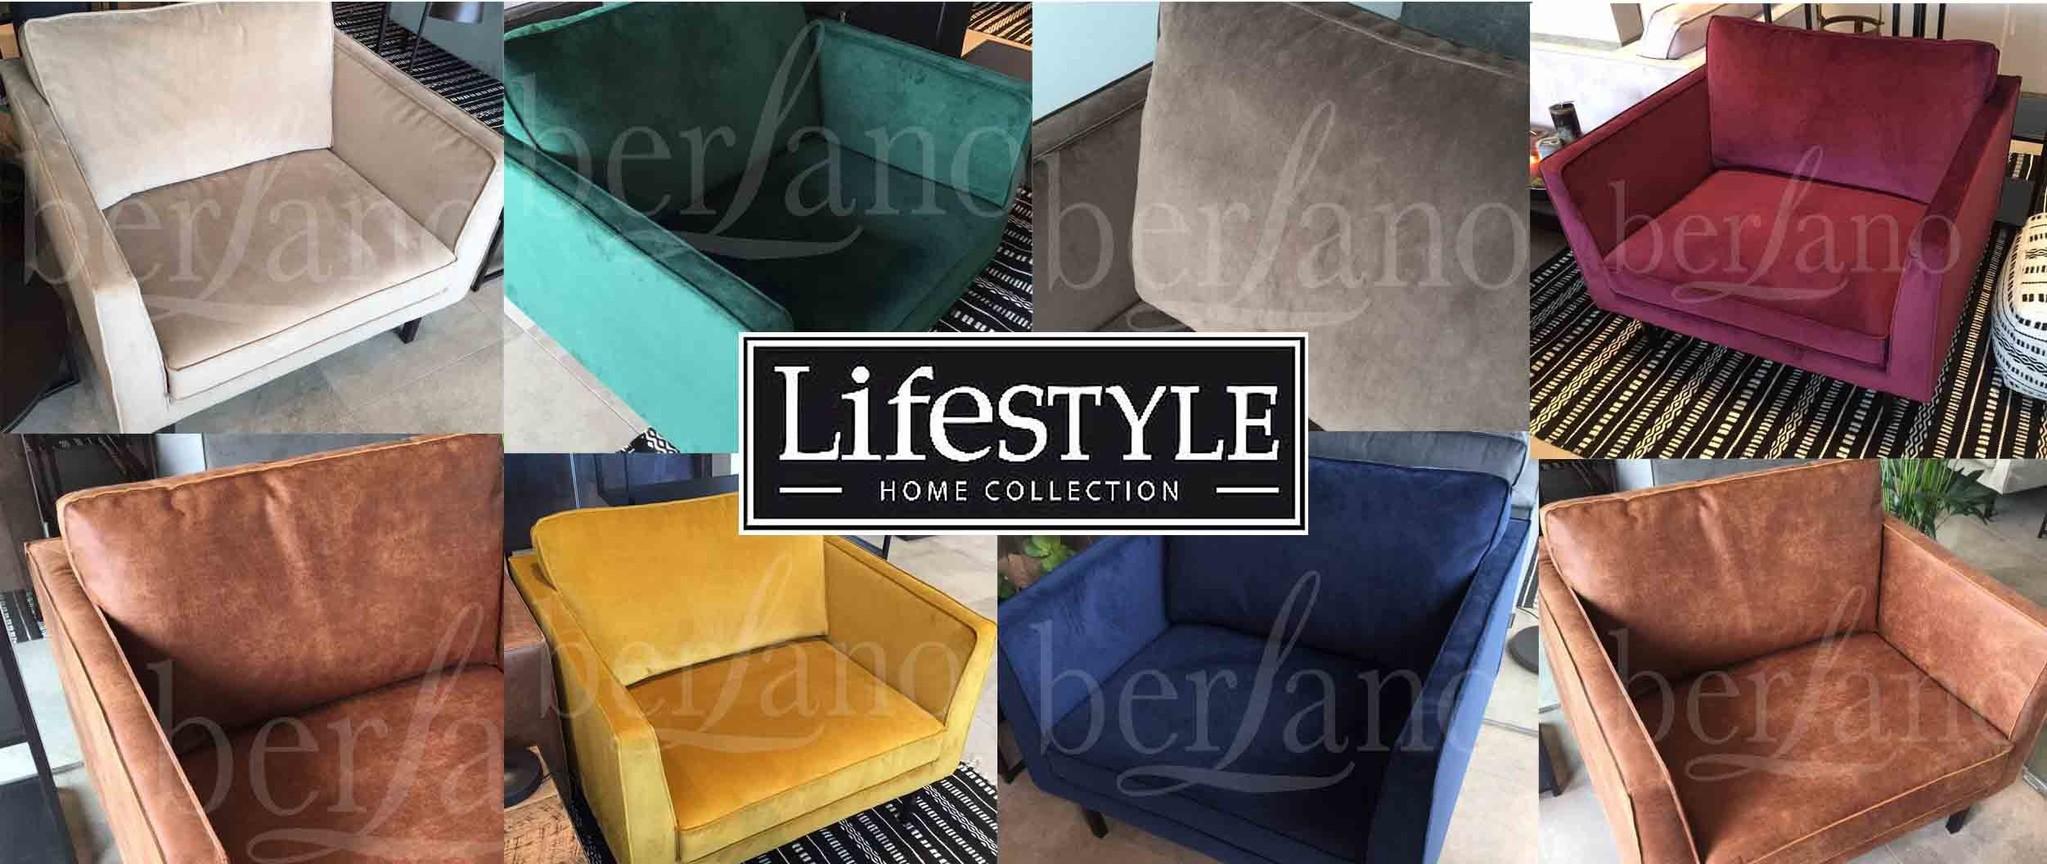 lifestyle-perugia-bank-hoekbank-fluweel-stof